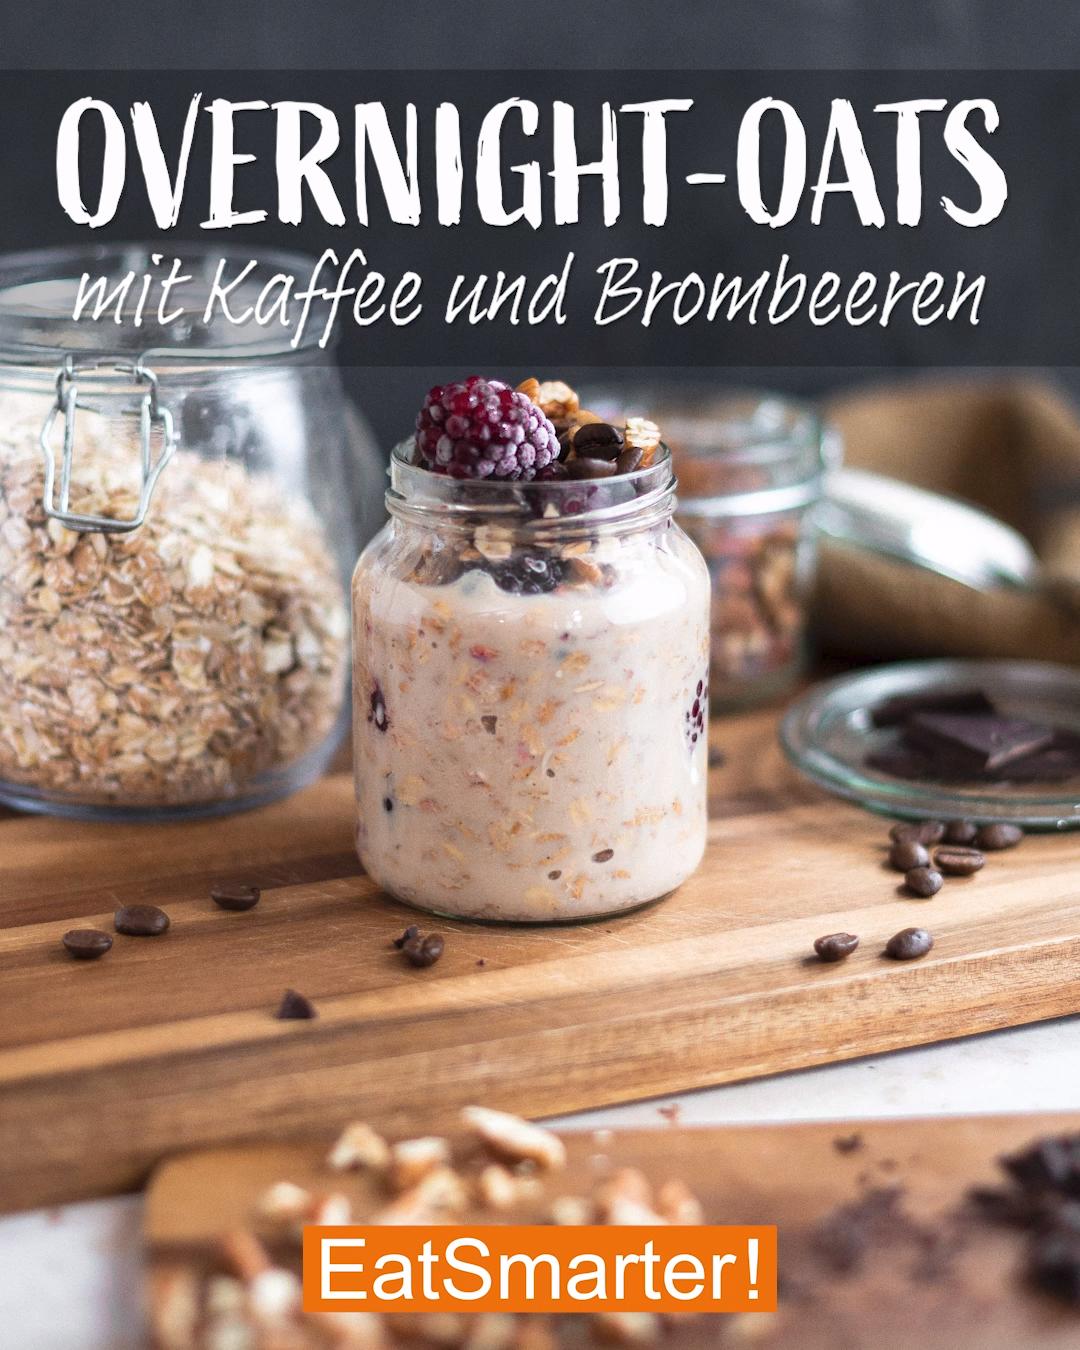 Overnight-Oats mit Kaffee und Brombeeren   EAT SMARTER